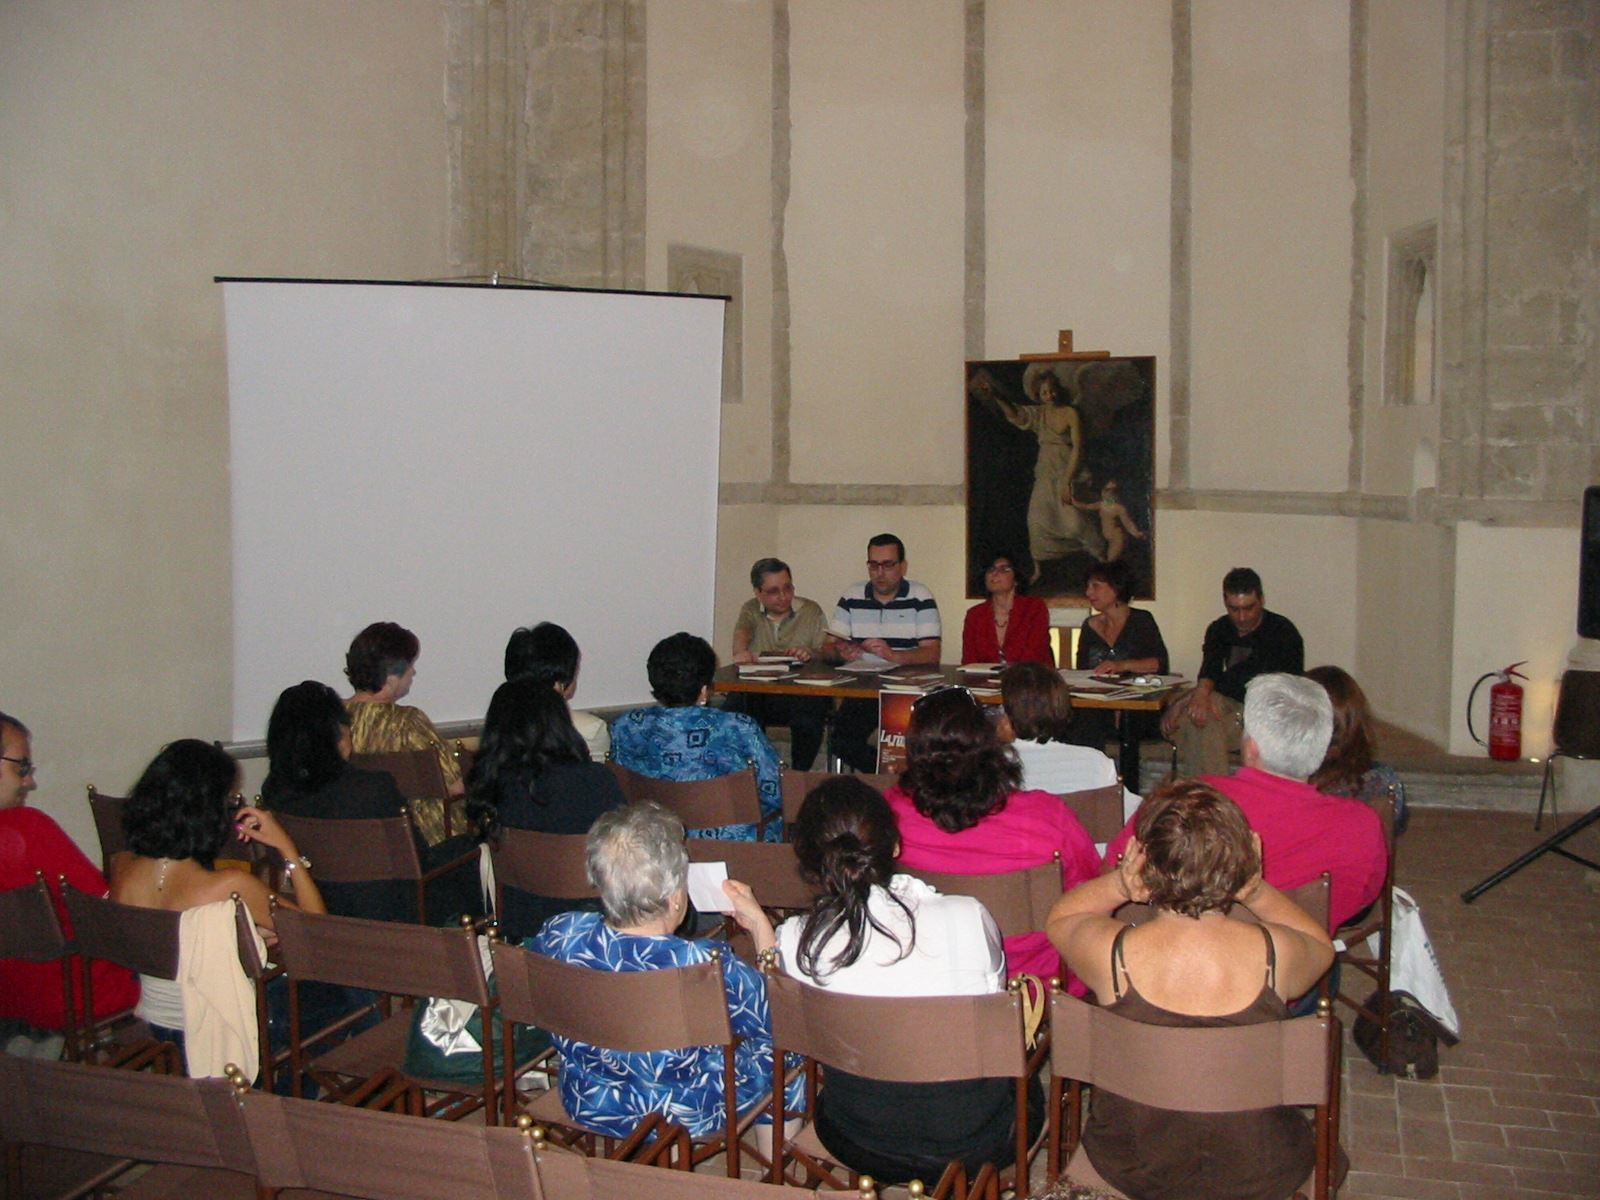 Da sinistra Emanuele Marcuccio, Lorenzo Spurio, Monica Fantaci, Pierangela Castagnetta, Salvuccio Barravecchia